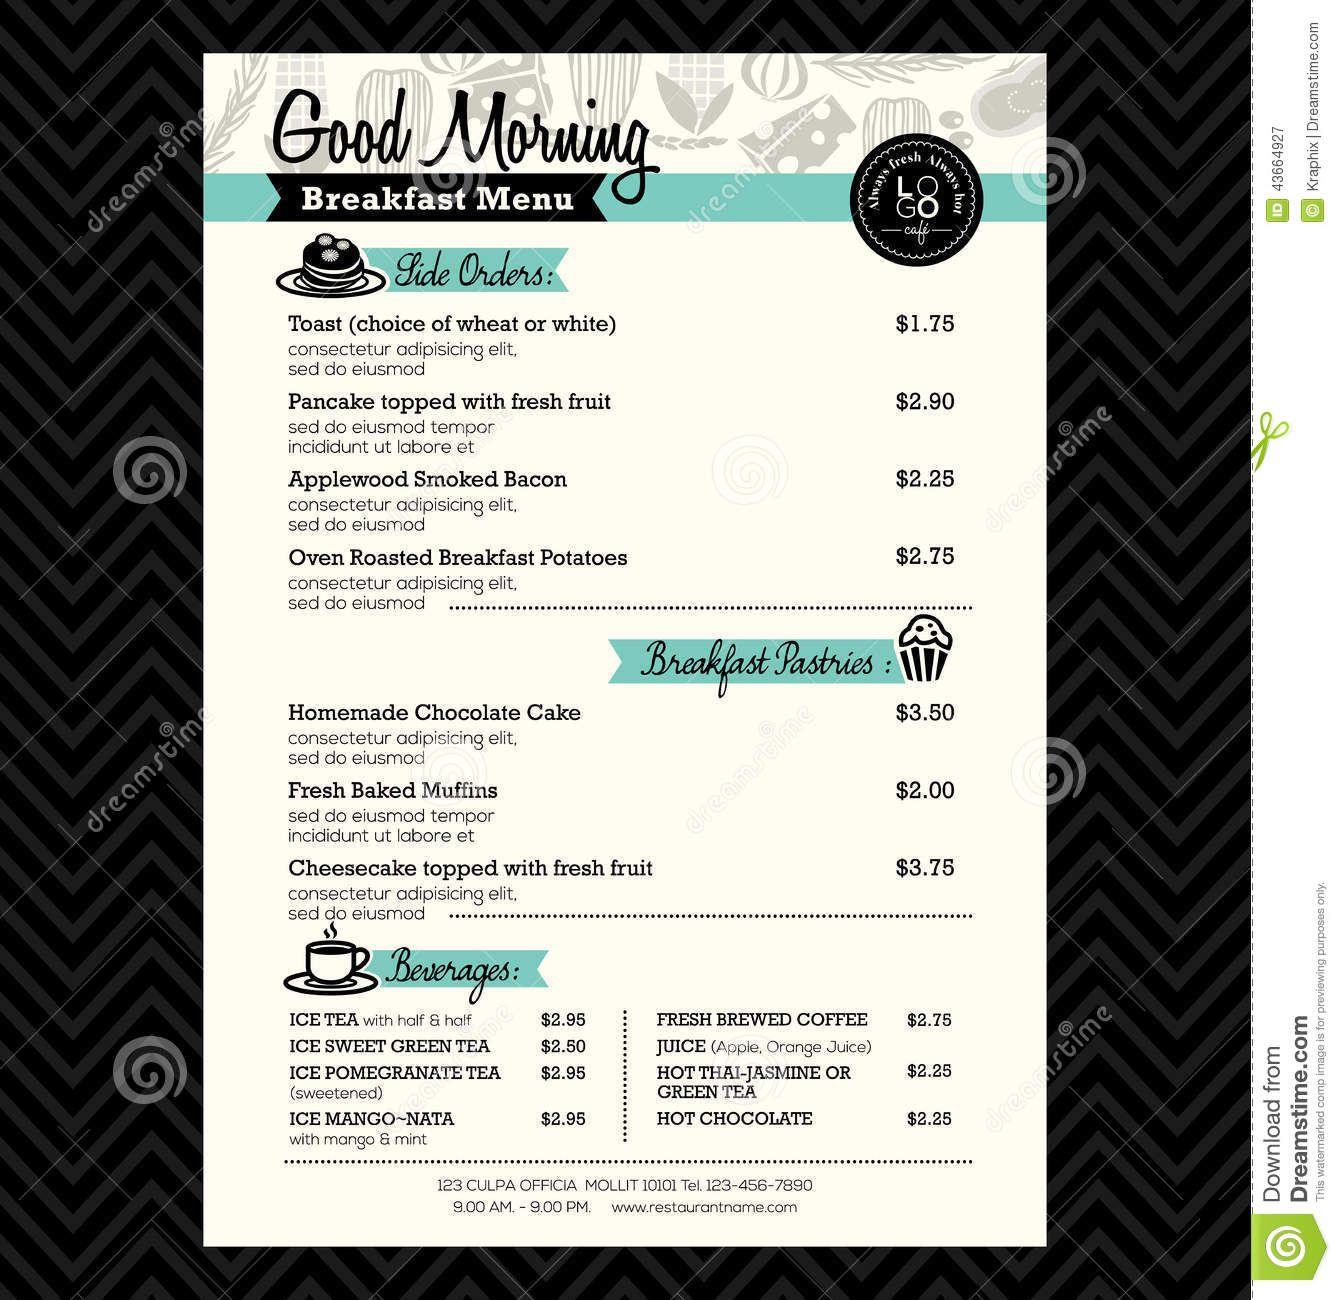 Breakfast Menu Design Ideas Google Search Menu Ristorante Idee